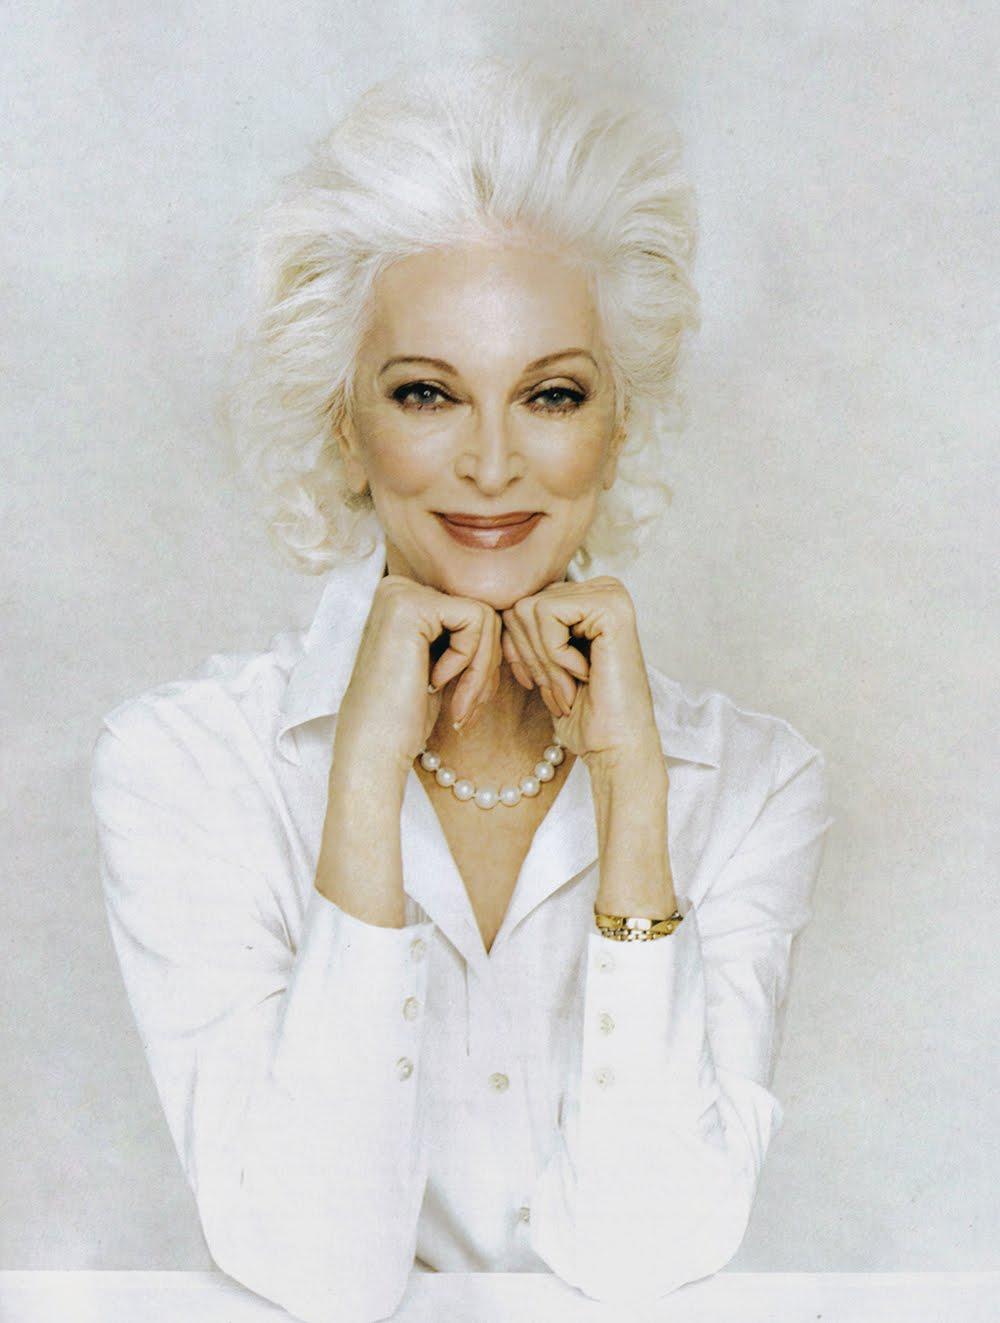 Piper Perabo Gallery Carmen Dell Orefice Top Model A Los